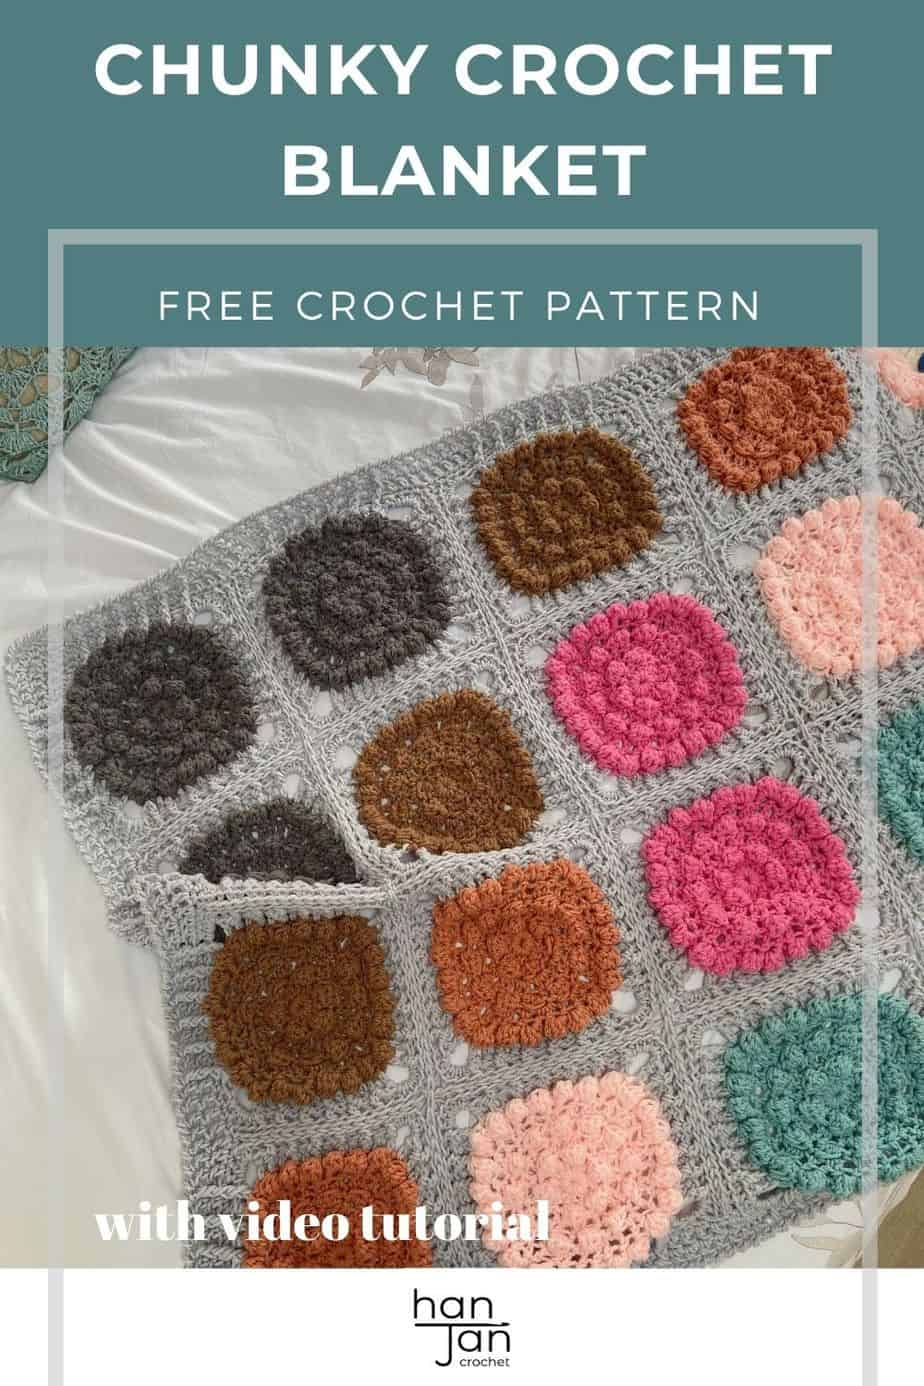 Chunky Crochet Blanket Pattern Super Alexa Blanket pin 1